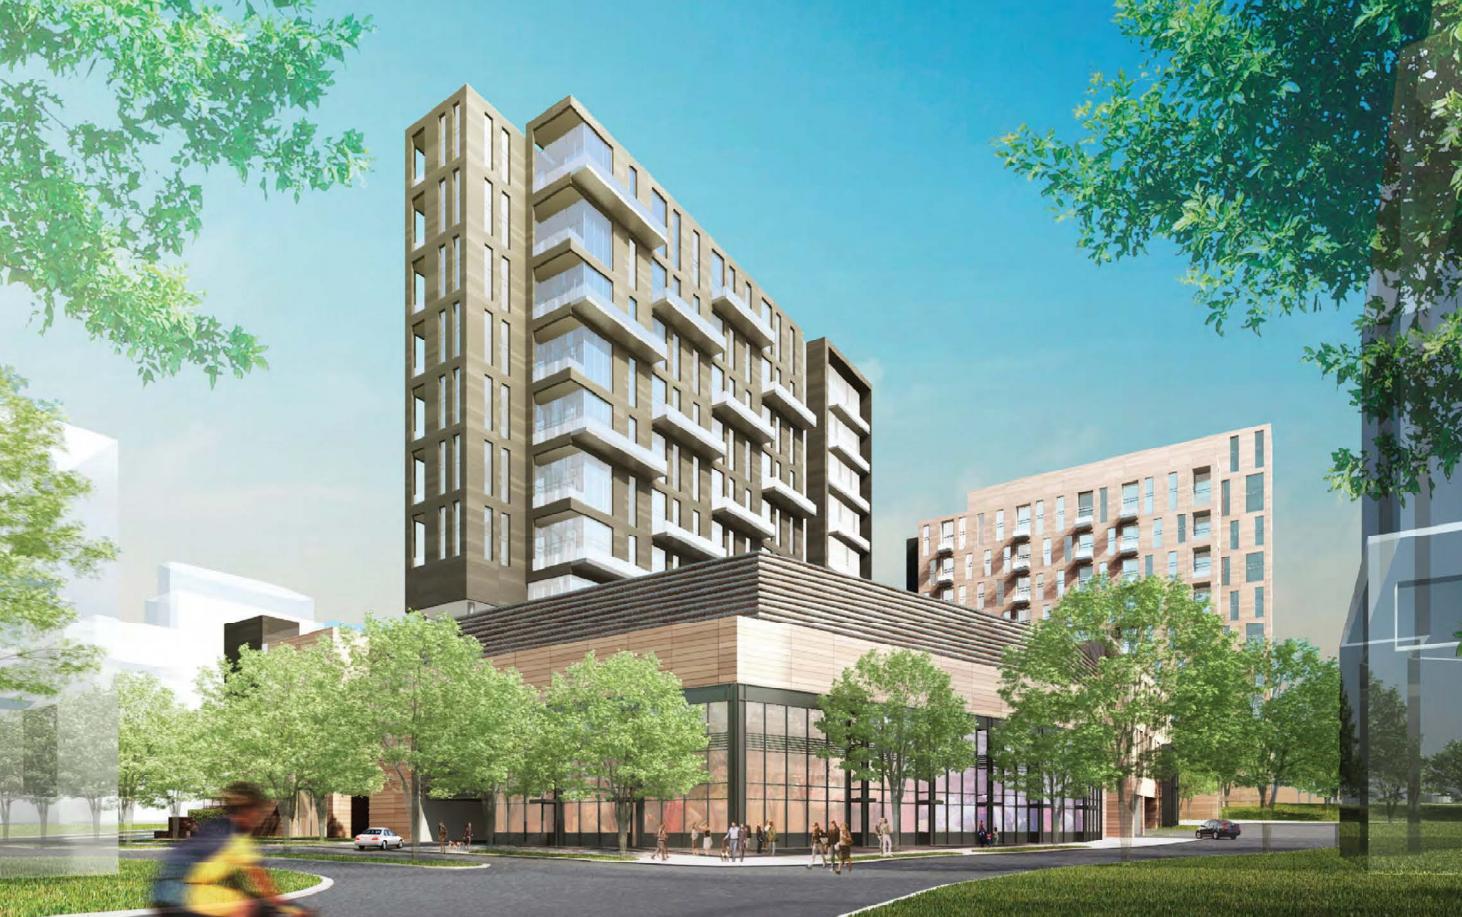 Update Reston Town Center Block 4 Project Gets Green